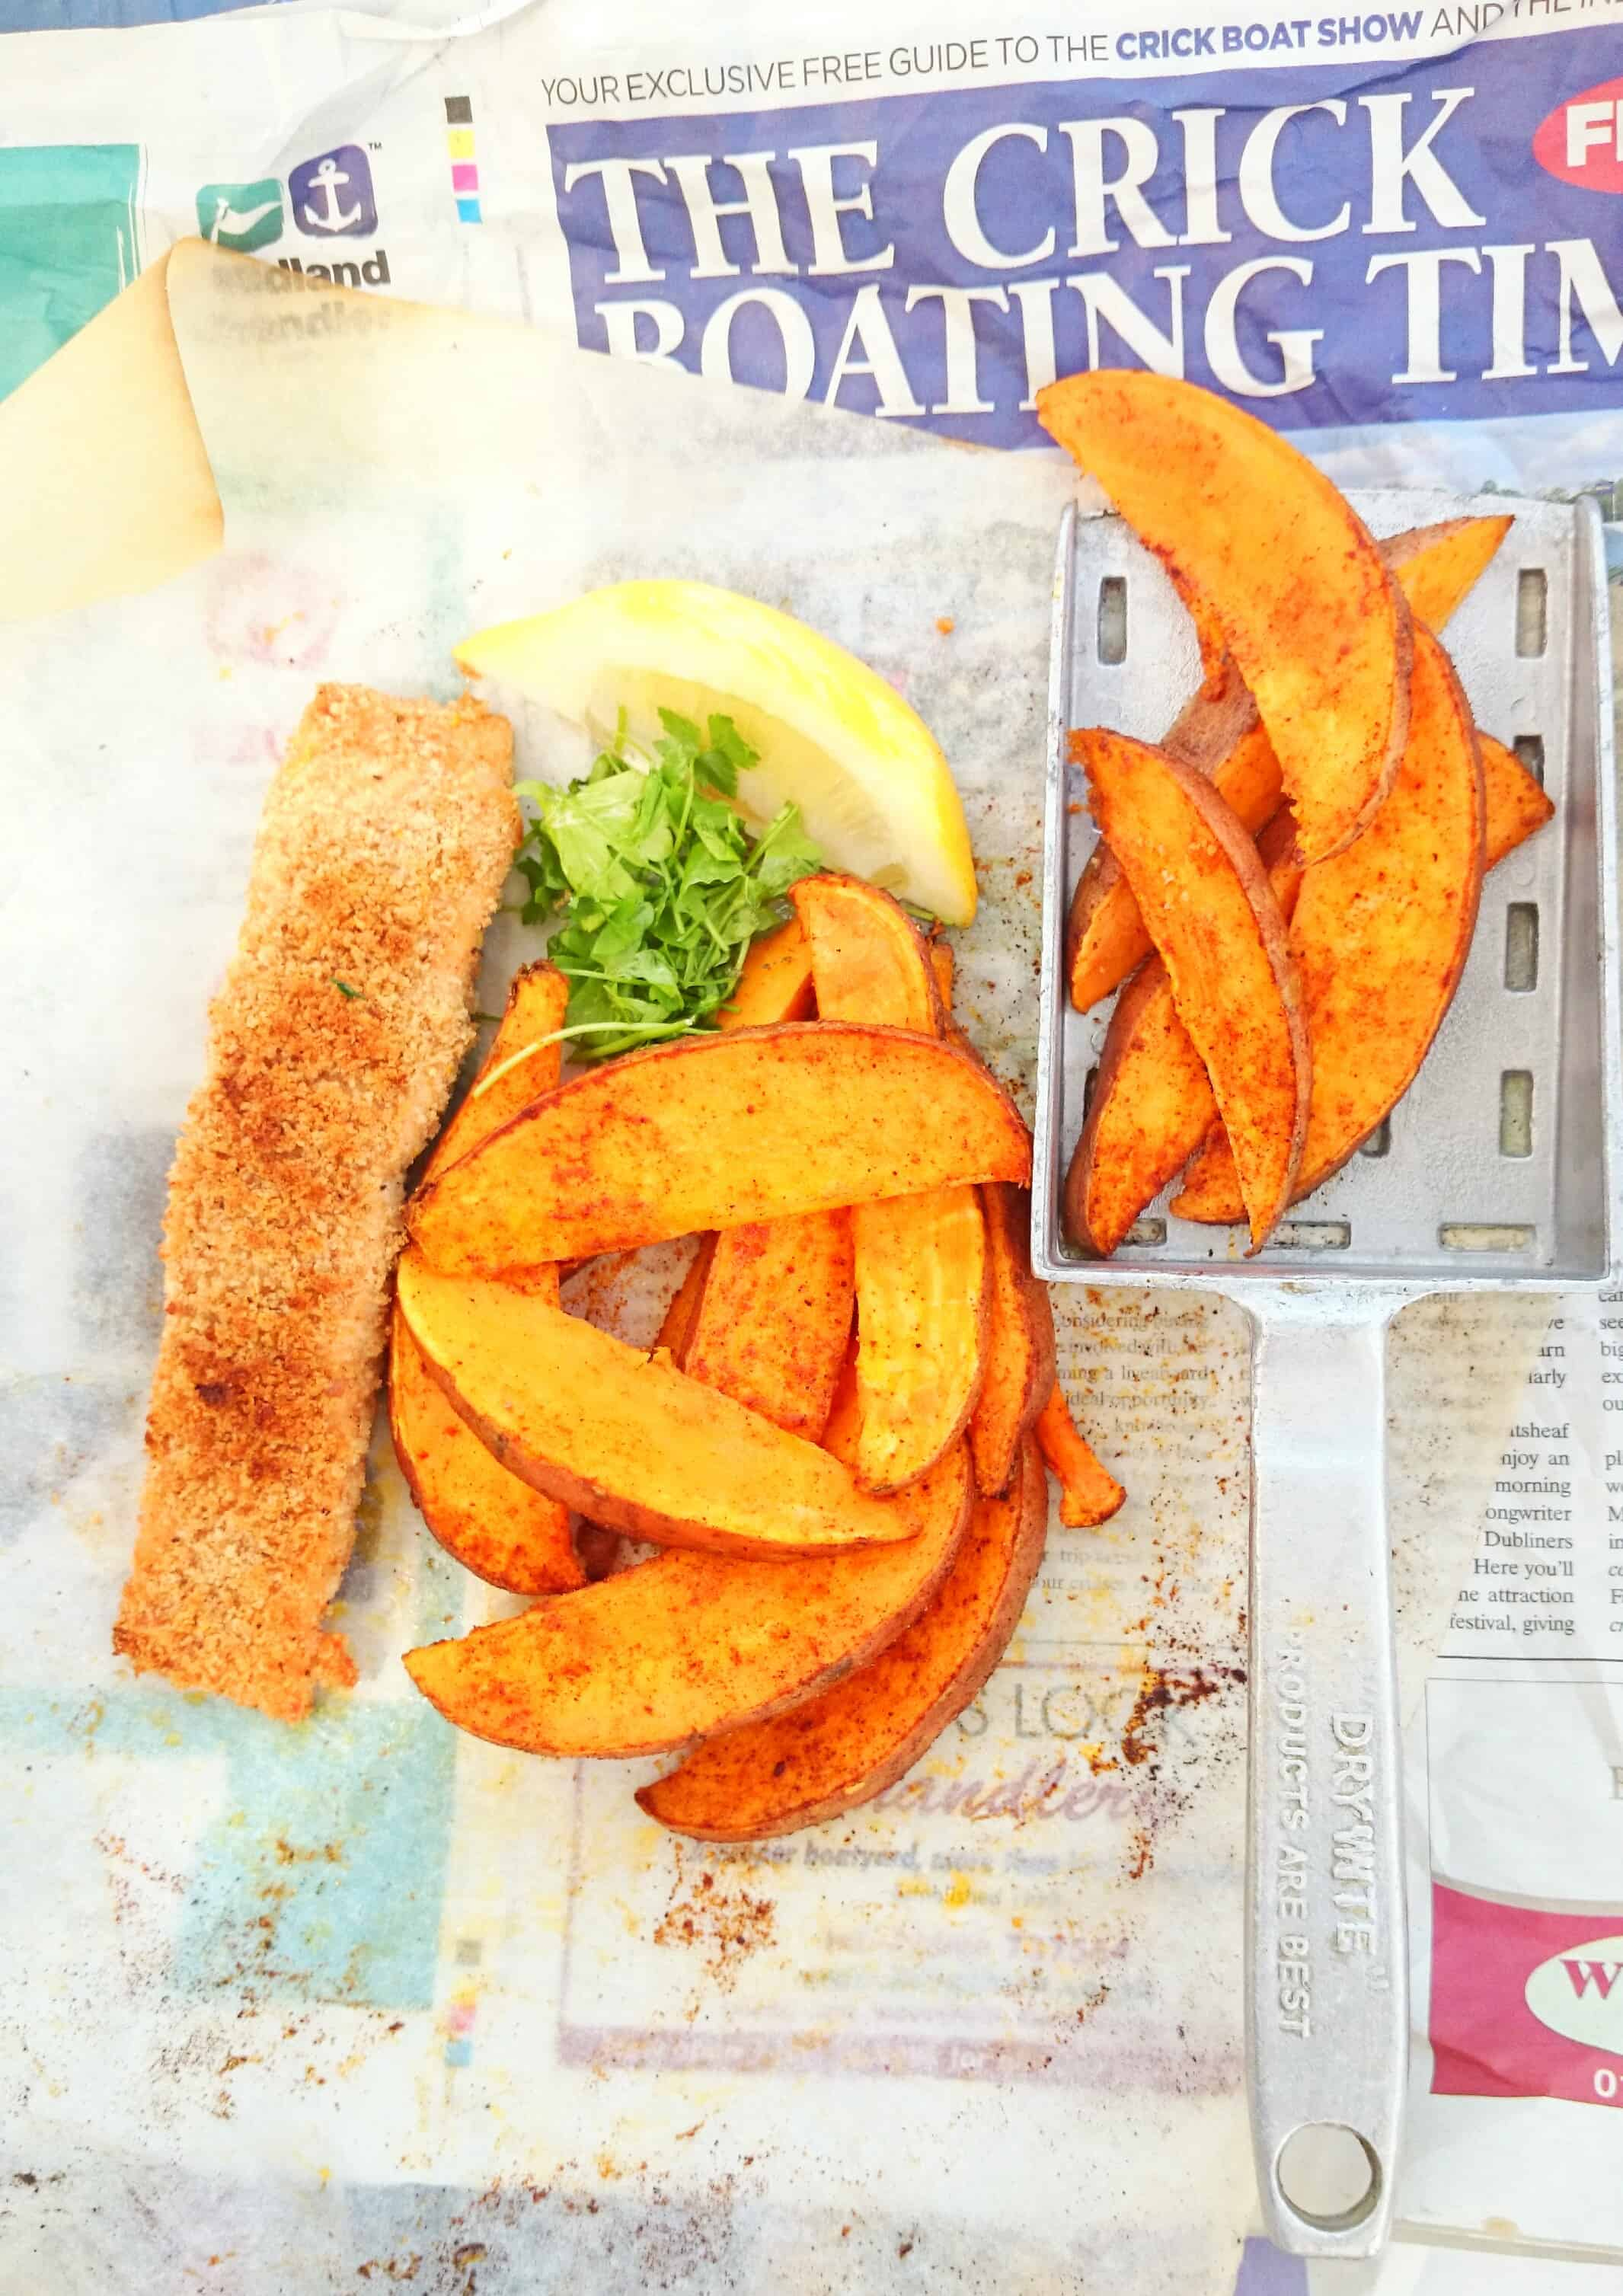 Posh Fish & Chips: Lemon & Parmesan Crust Salmon with Chillied Sweet Potato Chips – SERVES 4